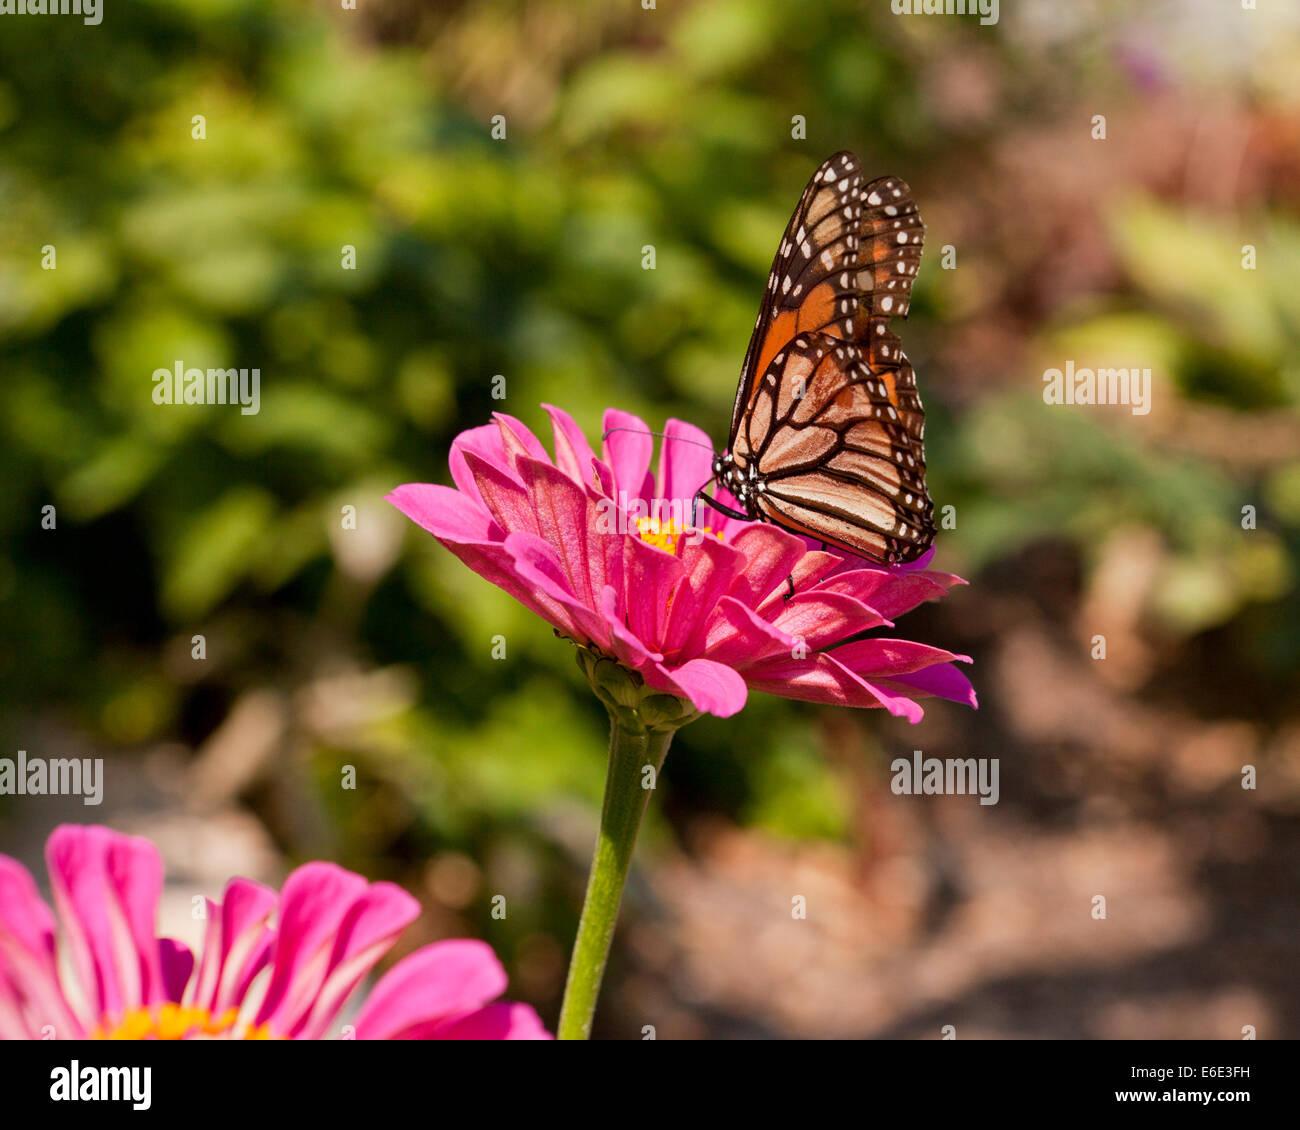 Female Monarch butterfly (Danaus plexippus) sitting on pink daisy flower - USA - Stock Image